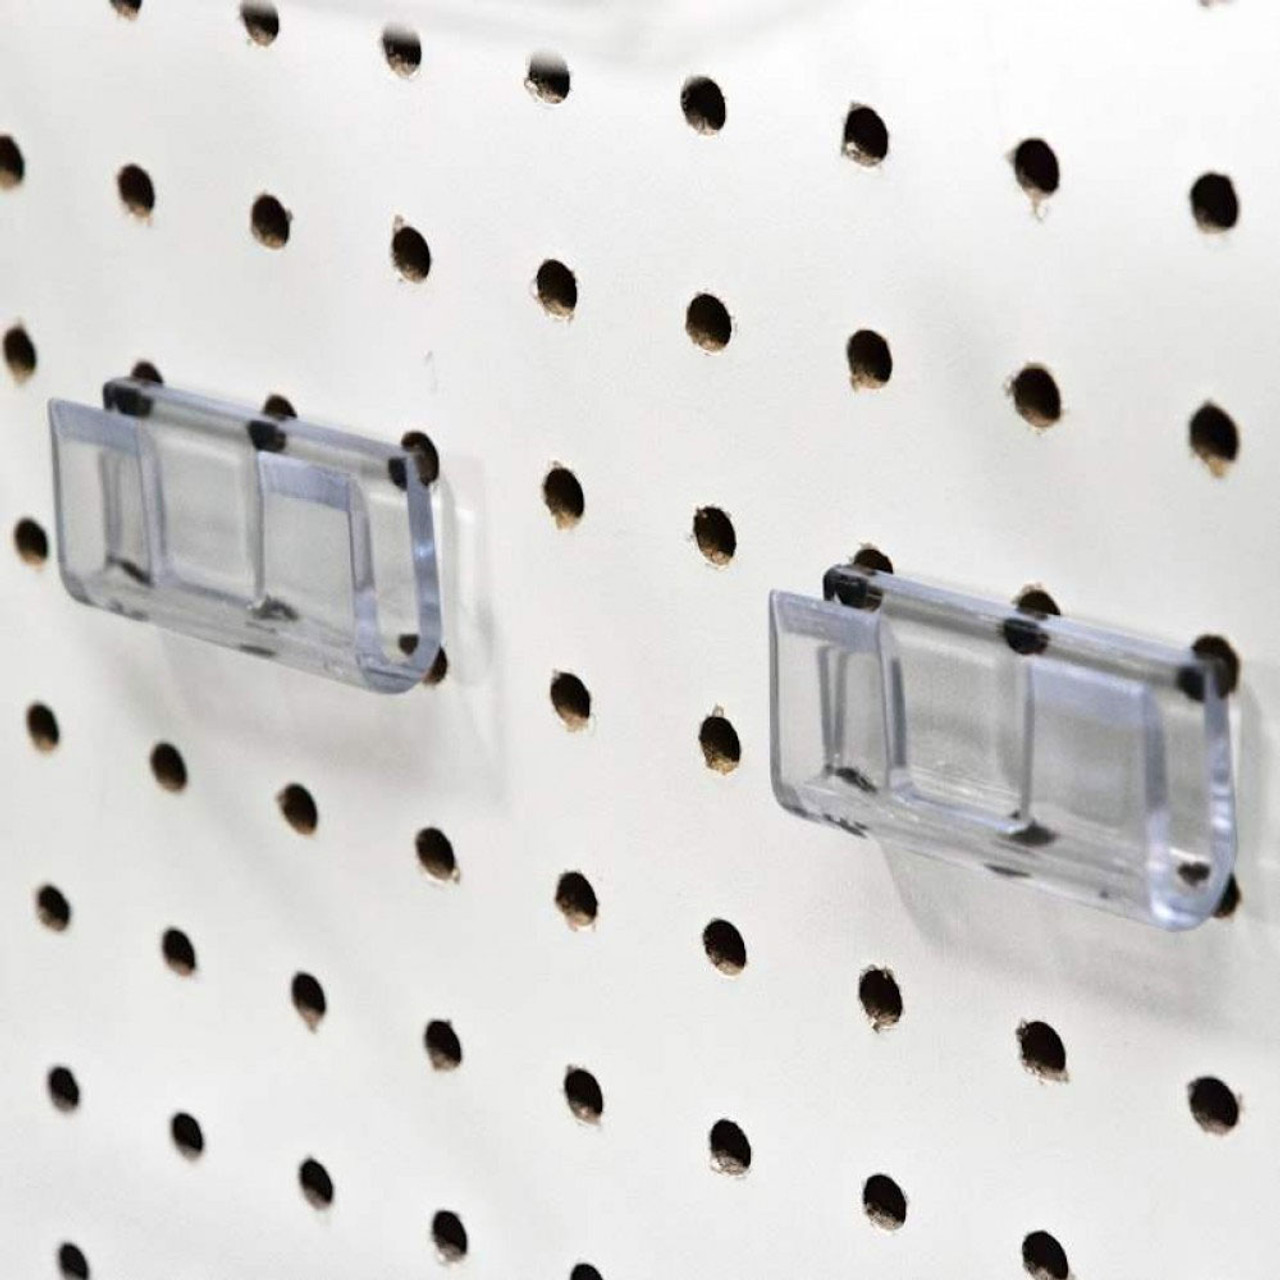 Pegboard/slatwall adapter - included with merchandising Bin